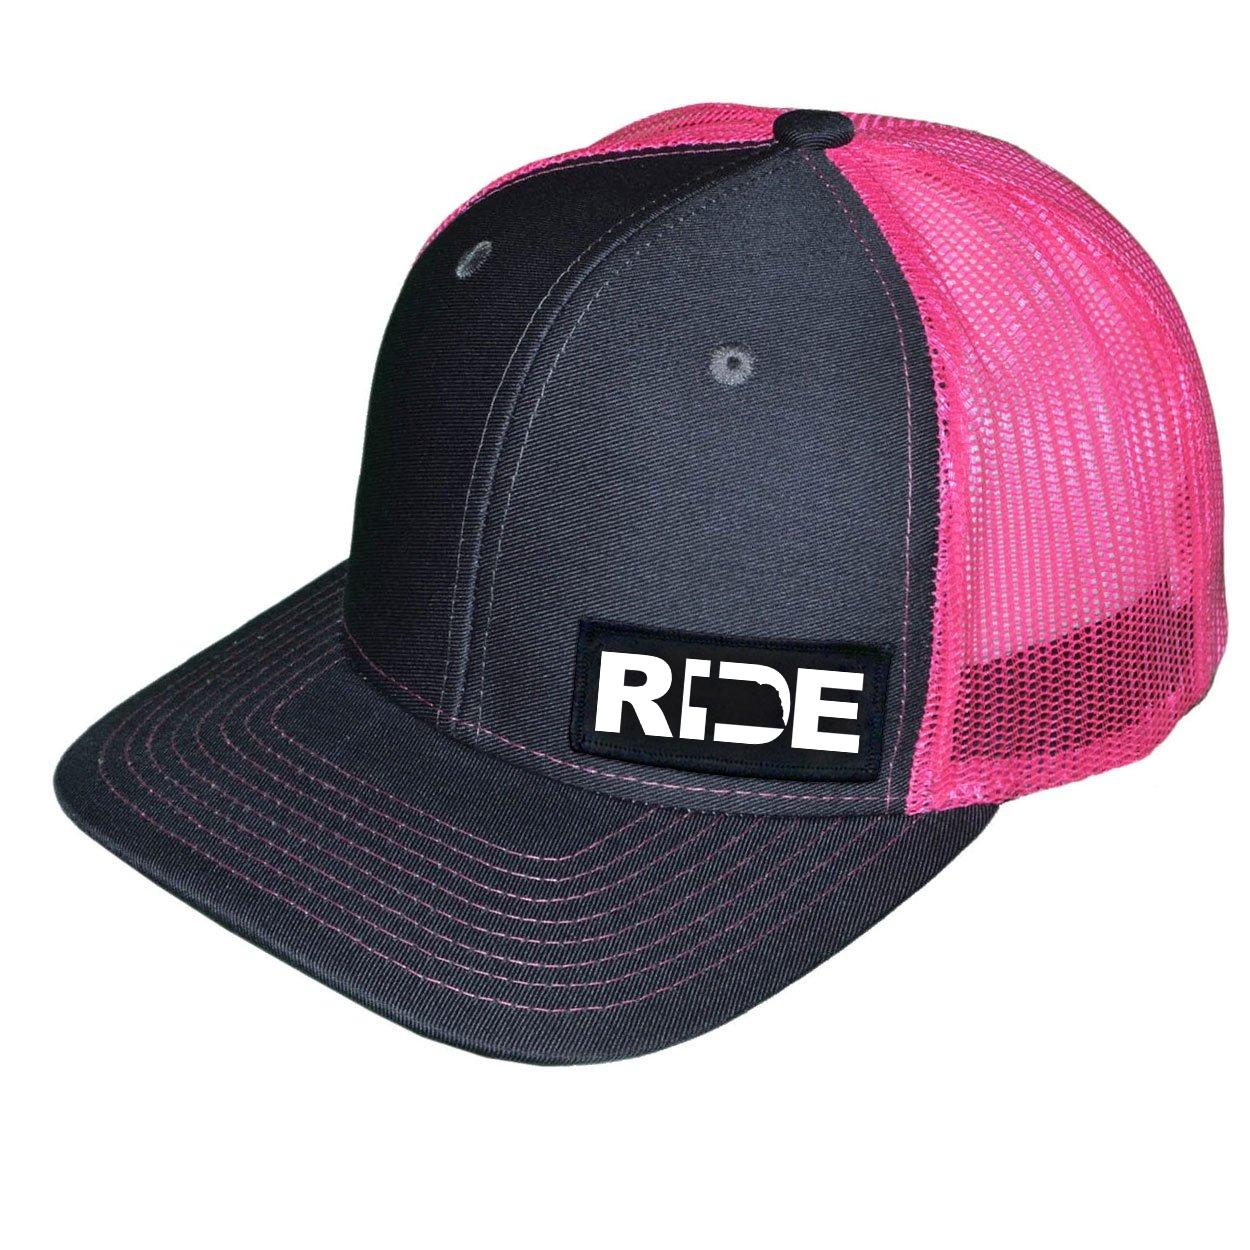 Ride Nebraska Night Out Woven Patch Snapback Trucker Hat Dark Gray/Neon Pink (White Logo)